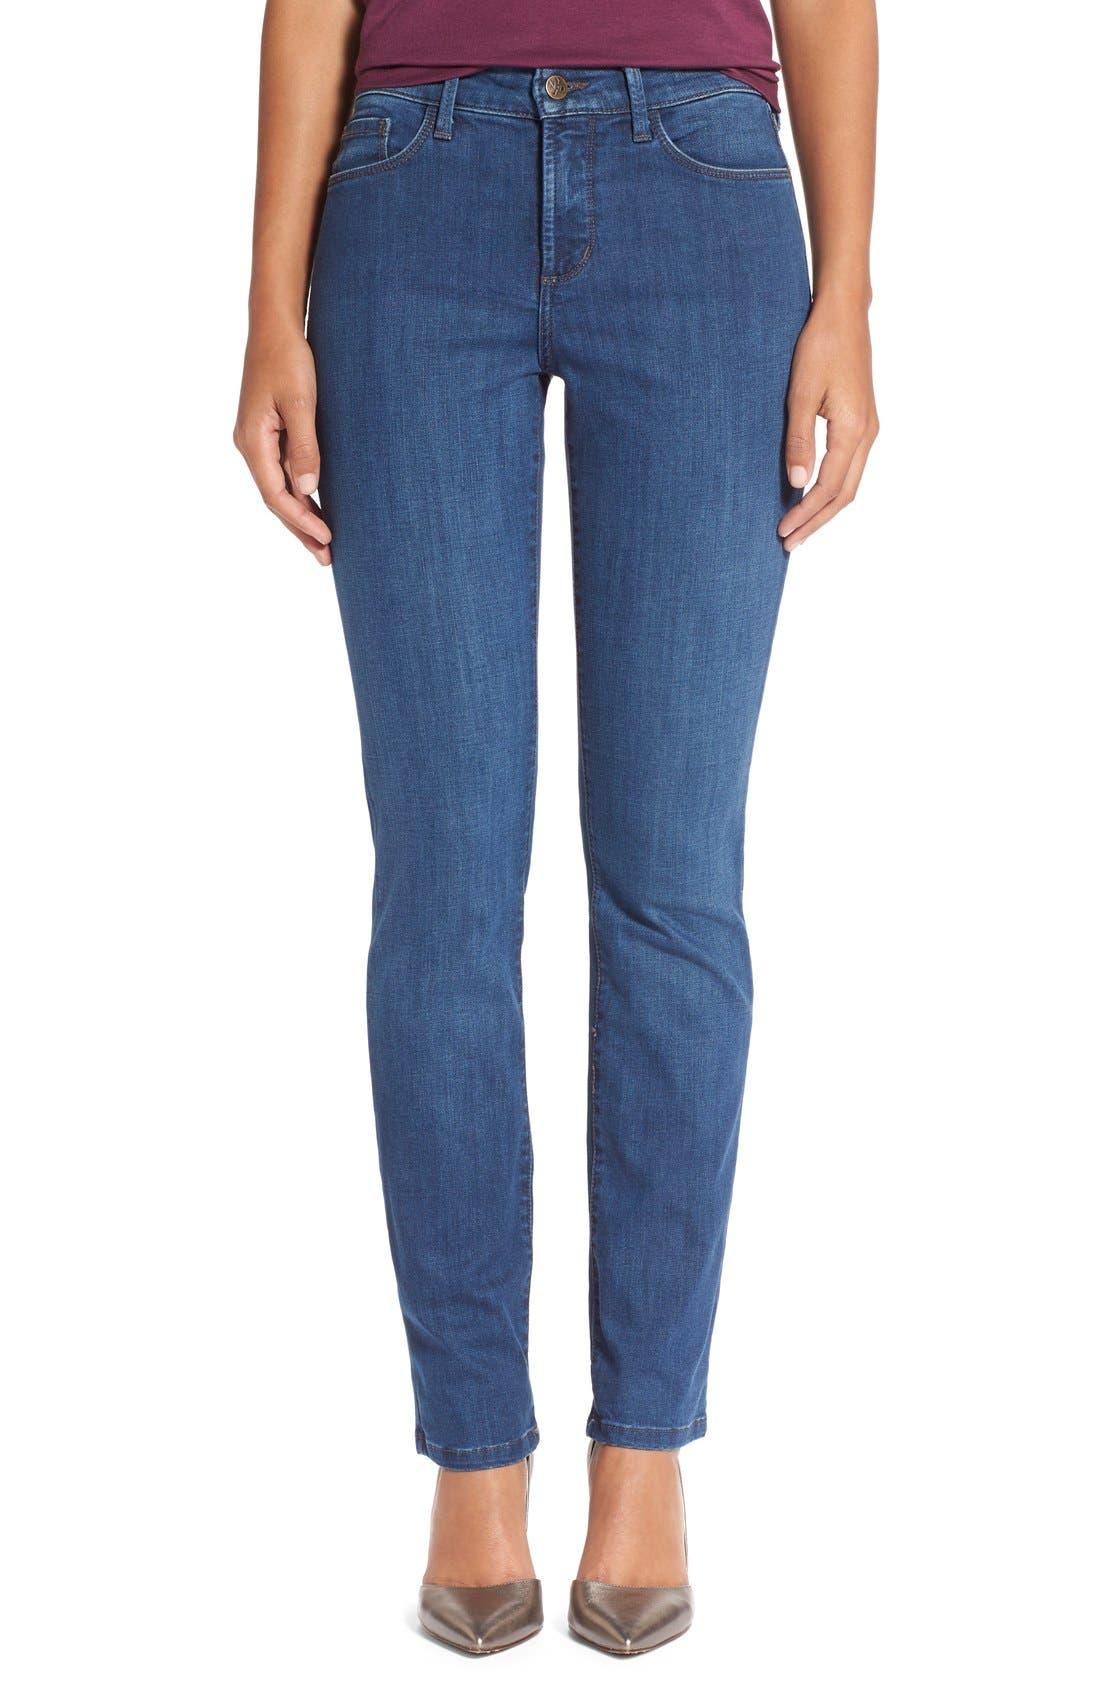 Alternate Image 1 Selected - NYDJ'Sheri' Stretch Skinny Jeans (Valencia)(Petite)